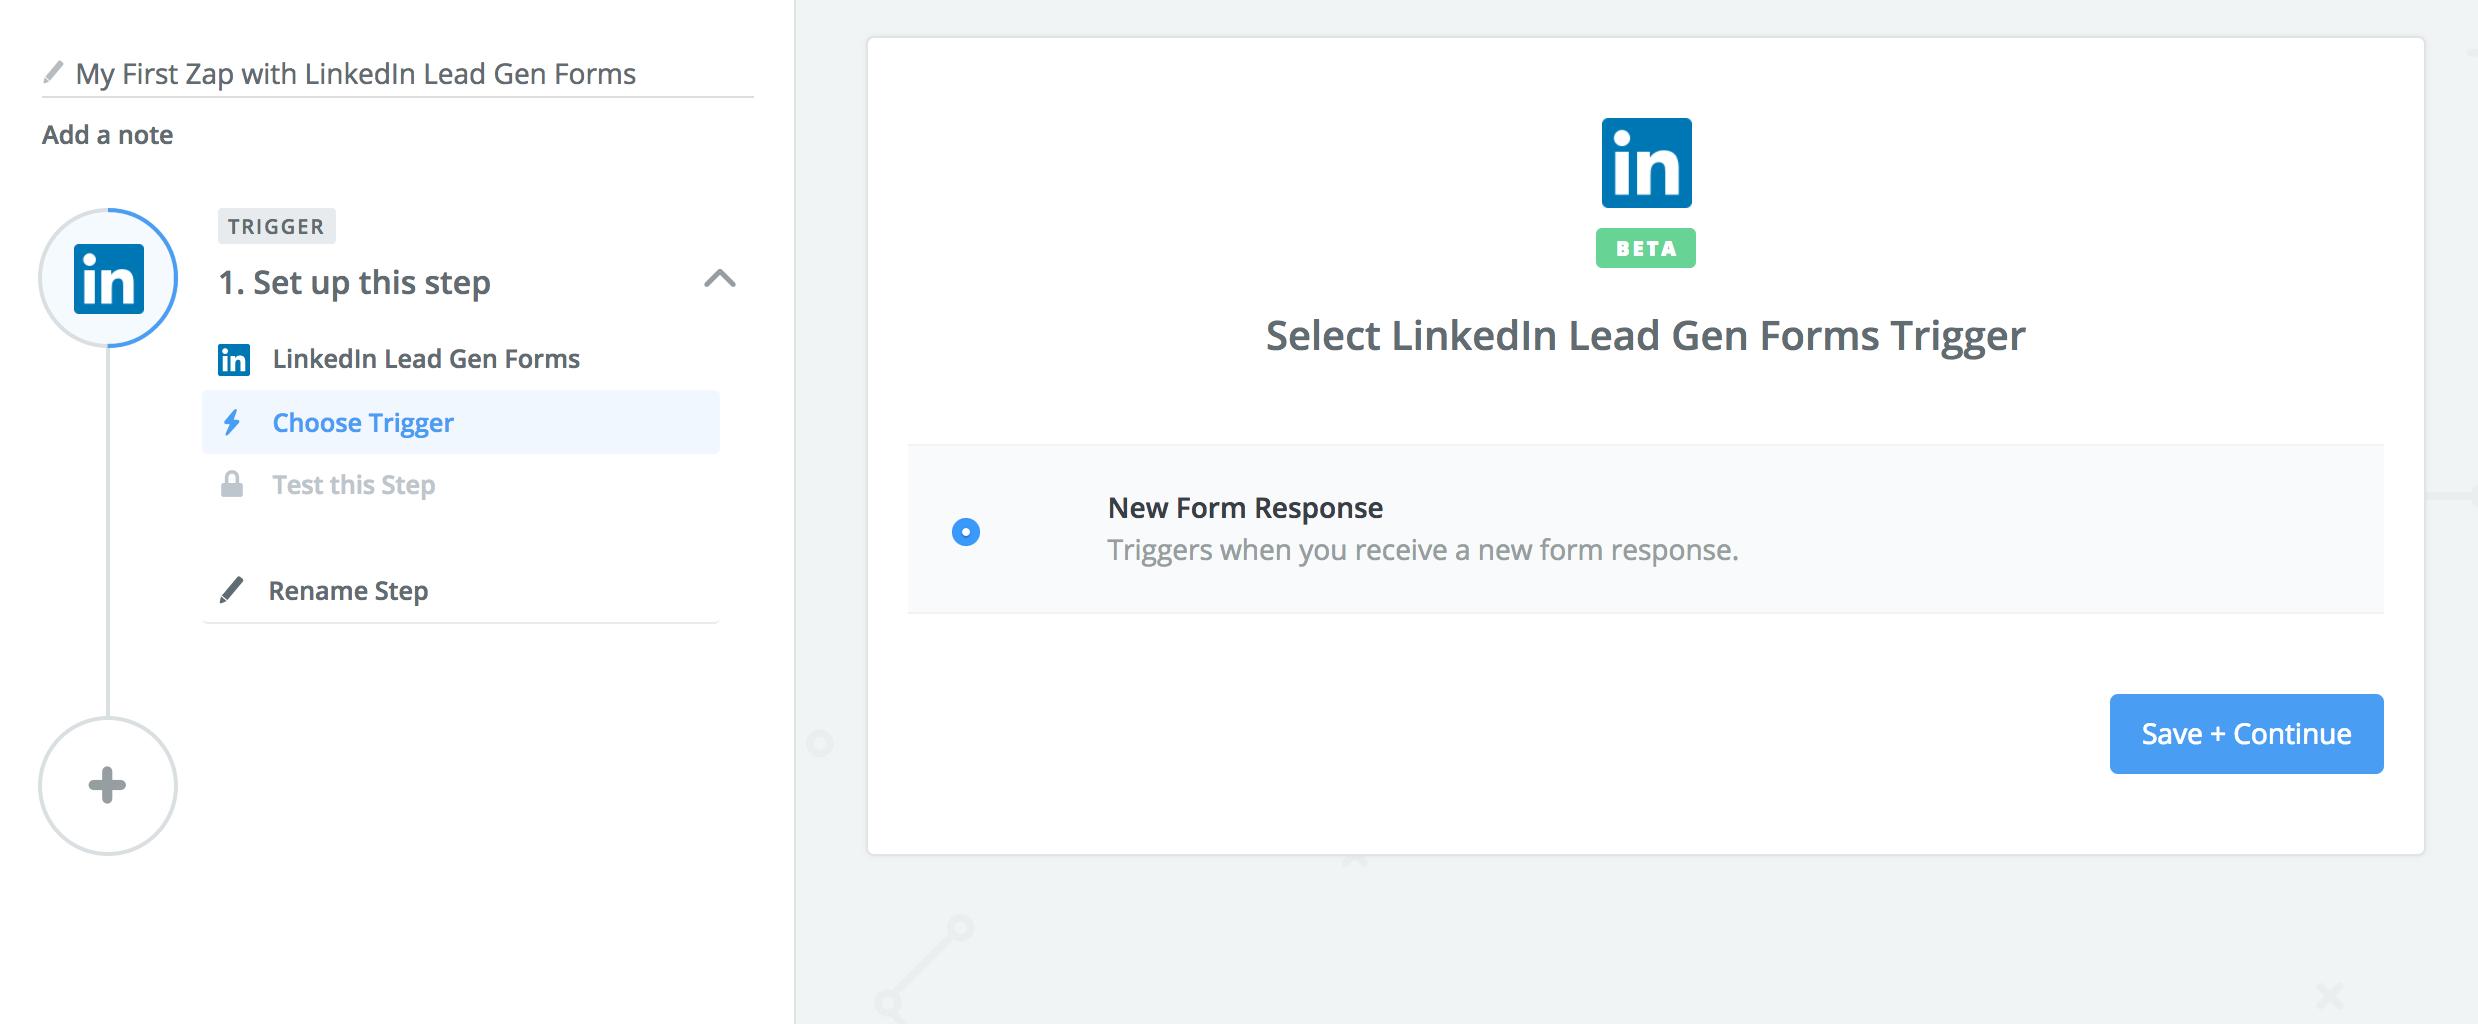 LinkedIn Lead Gen Forms Zapier Trigger